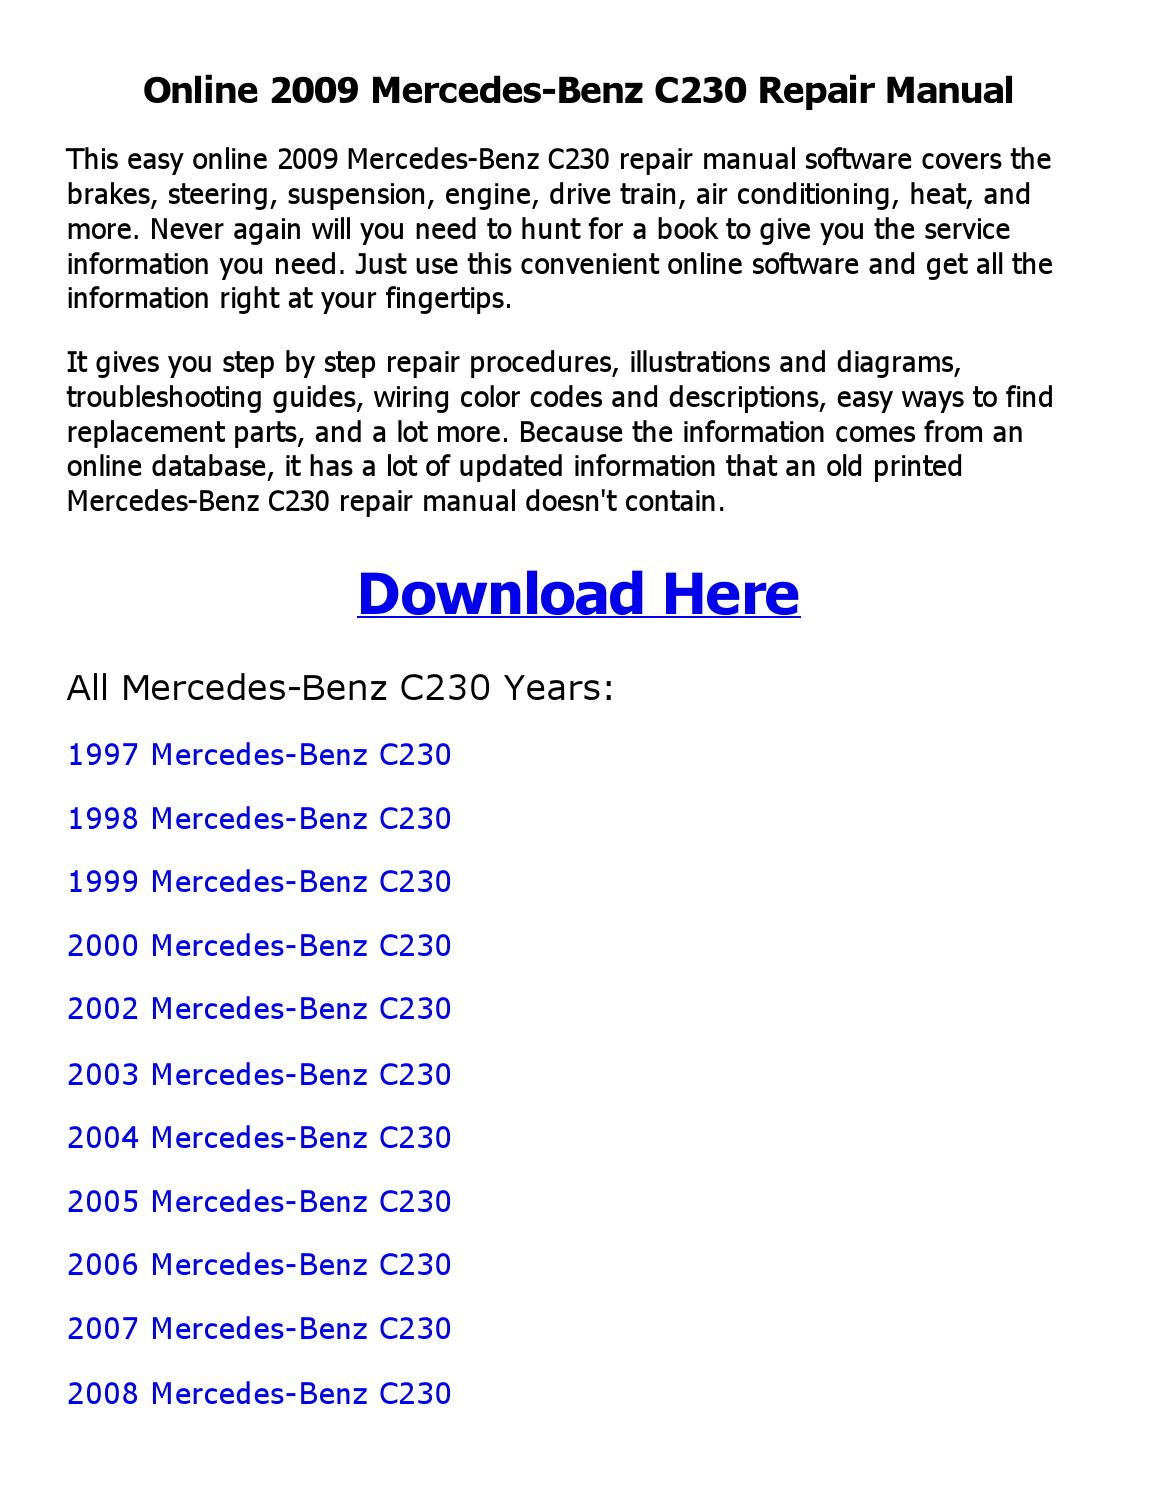 Pleasing 2009 Mercedes Benz C230 Repair Manual Online By Chaudhary Issuu Wiring Cloud Hisonuggs Outletorg